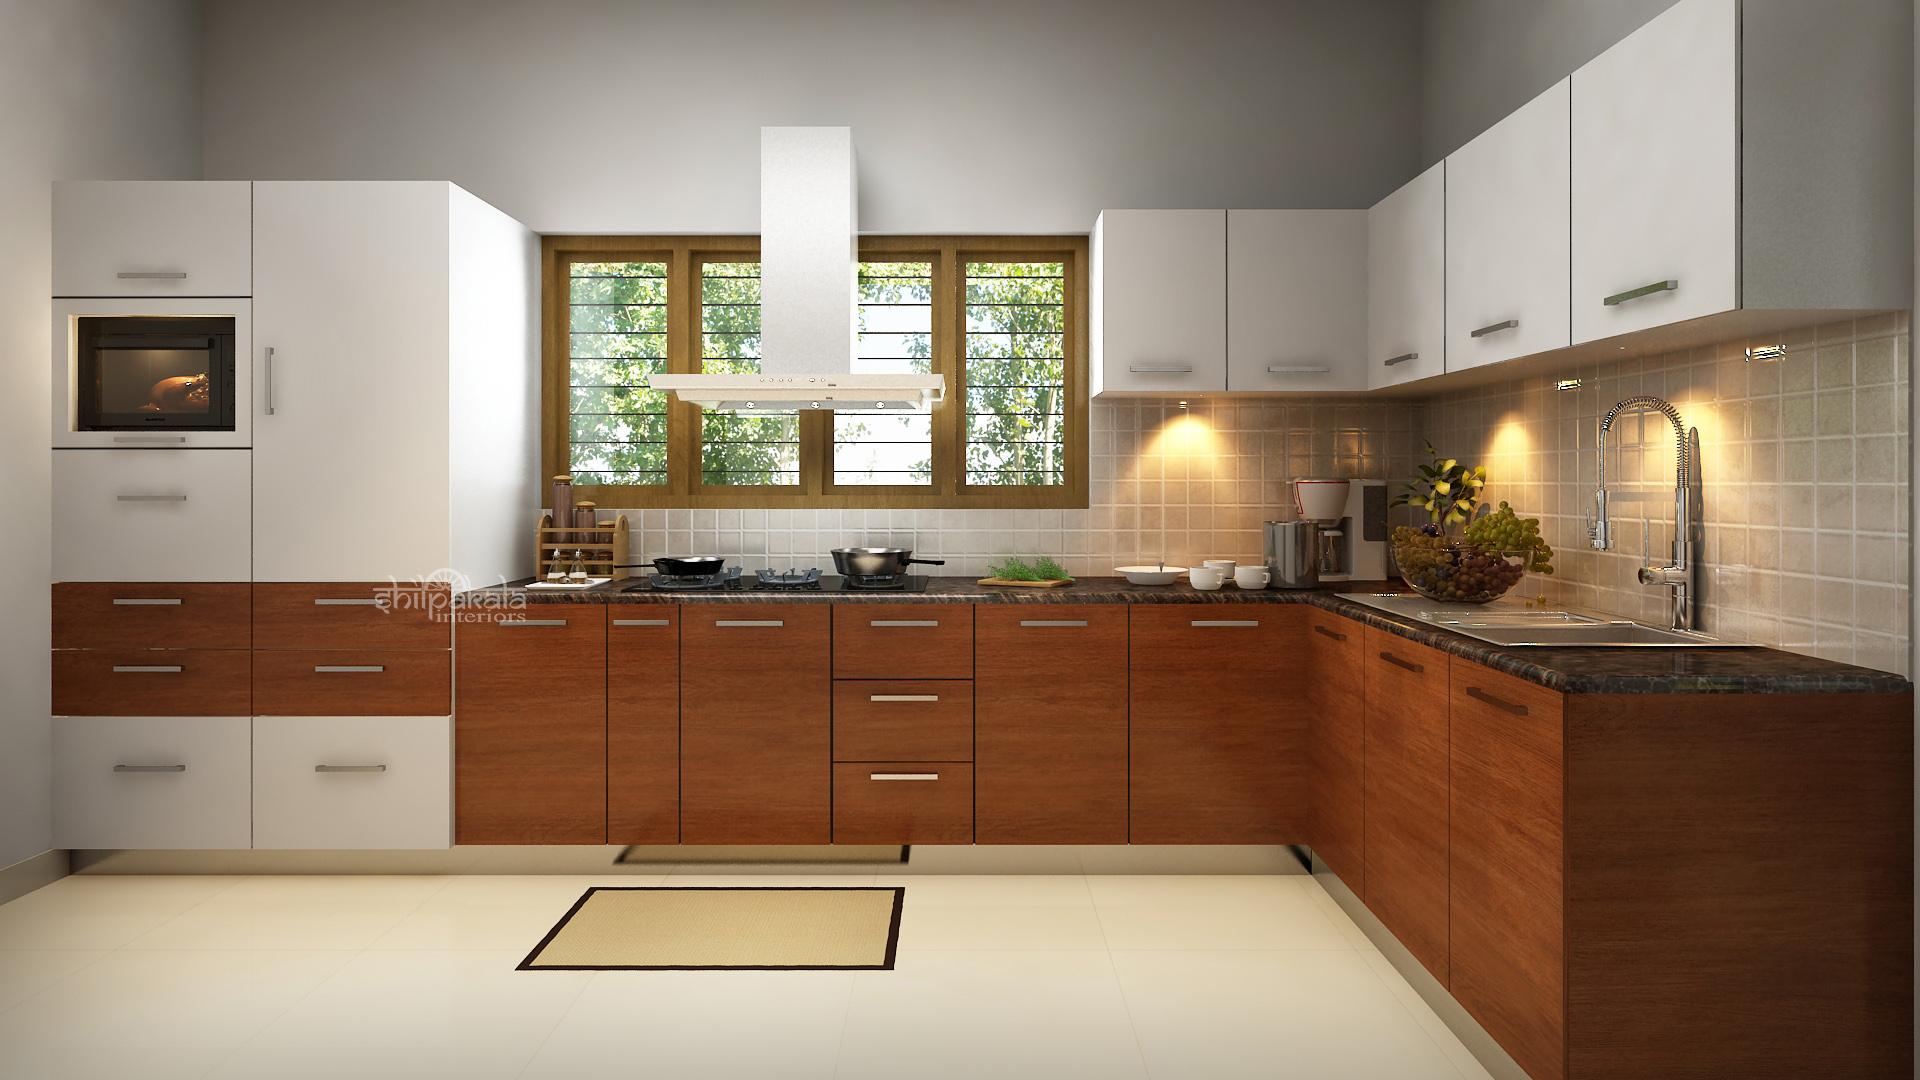 Four Bedroom Interior Design Premium Packages For Home Kerala